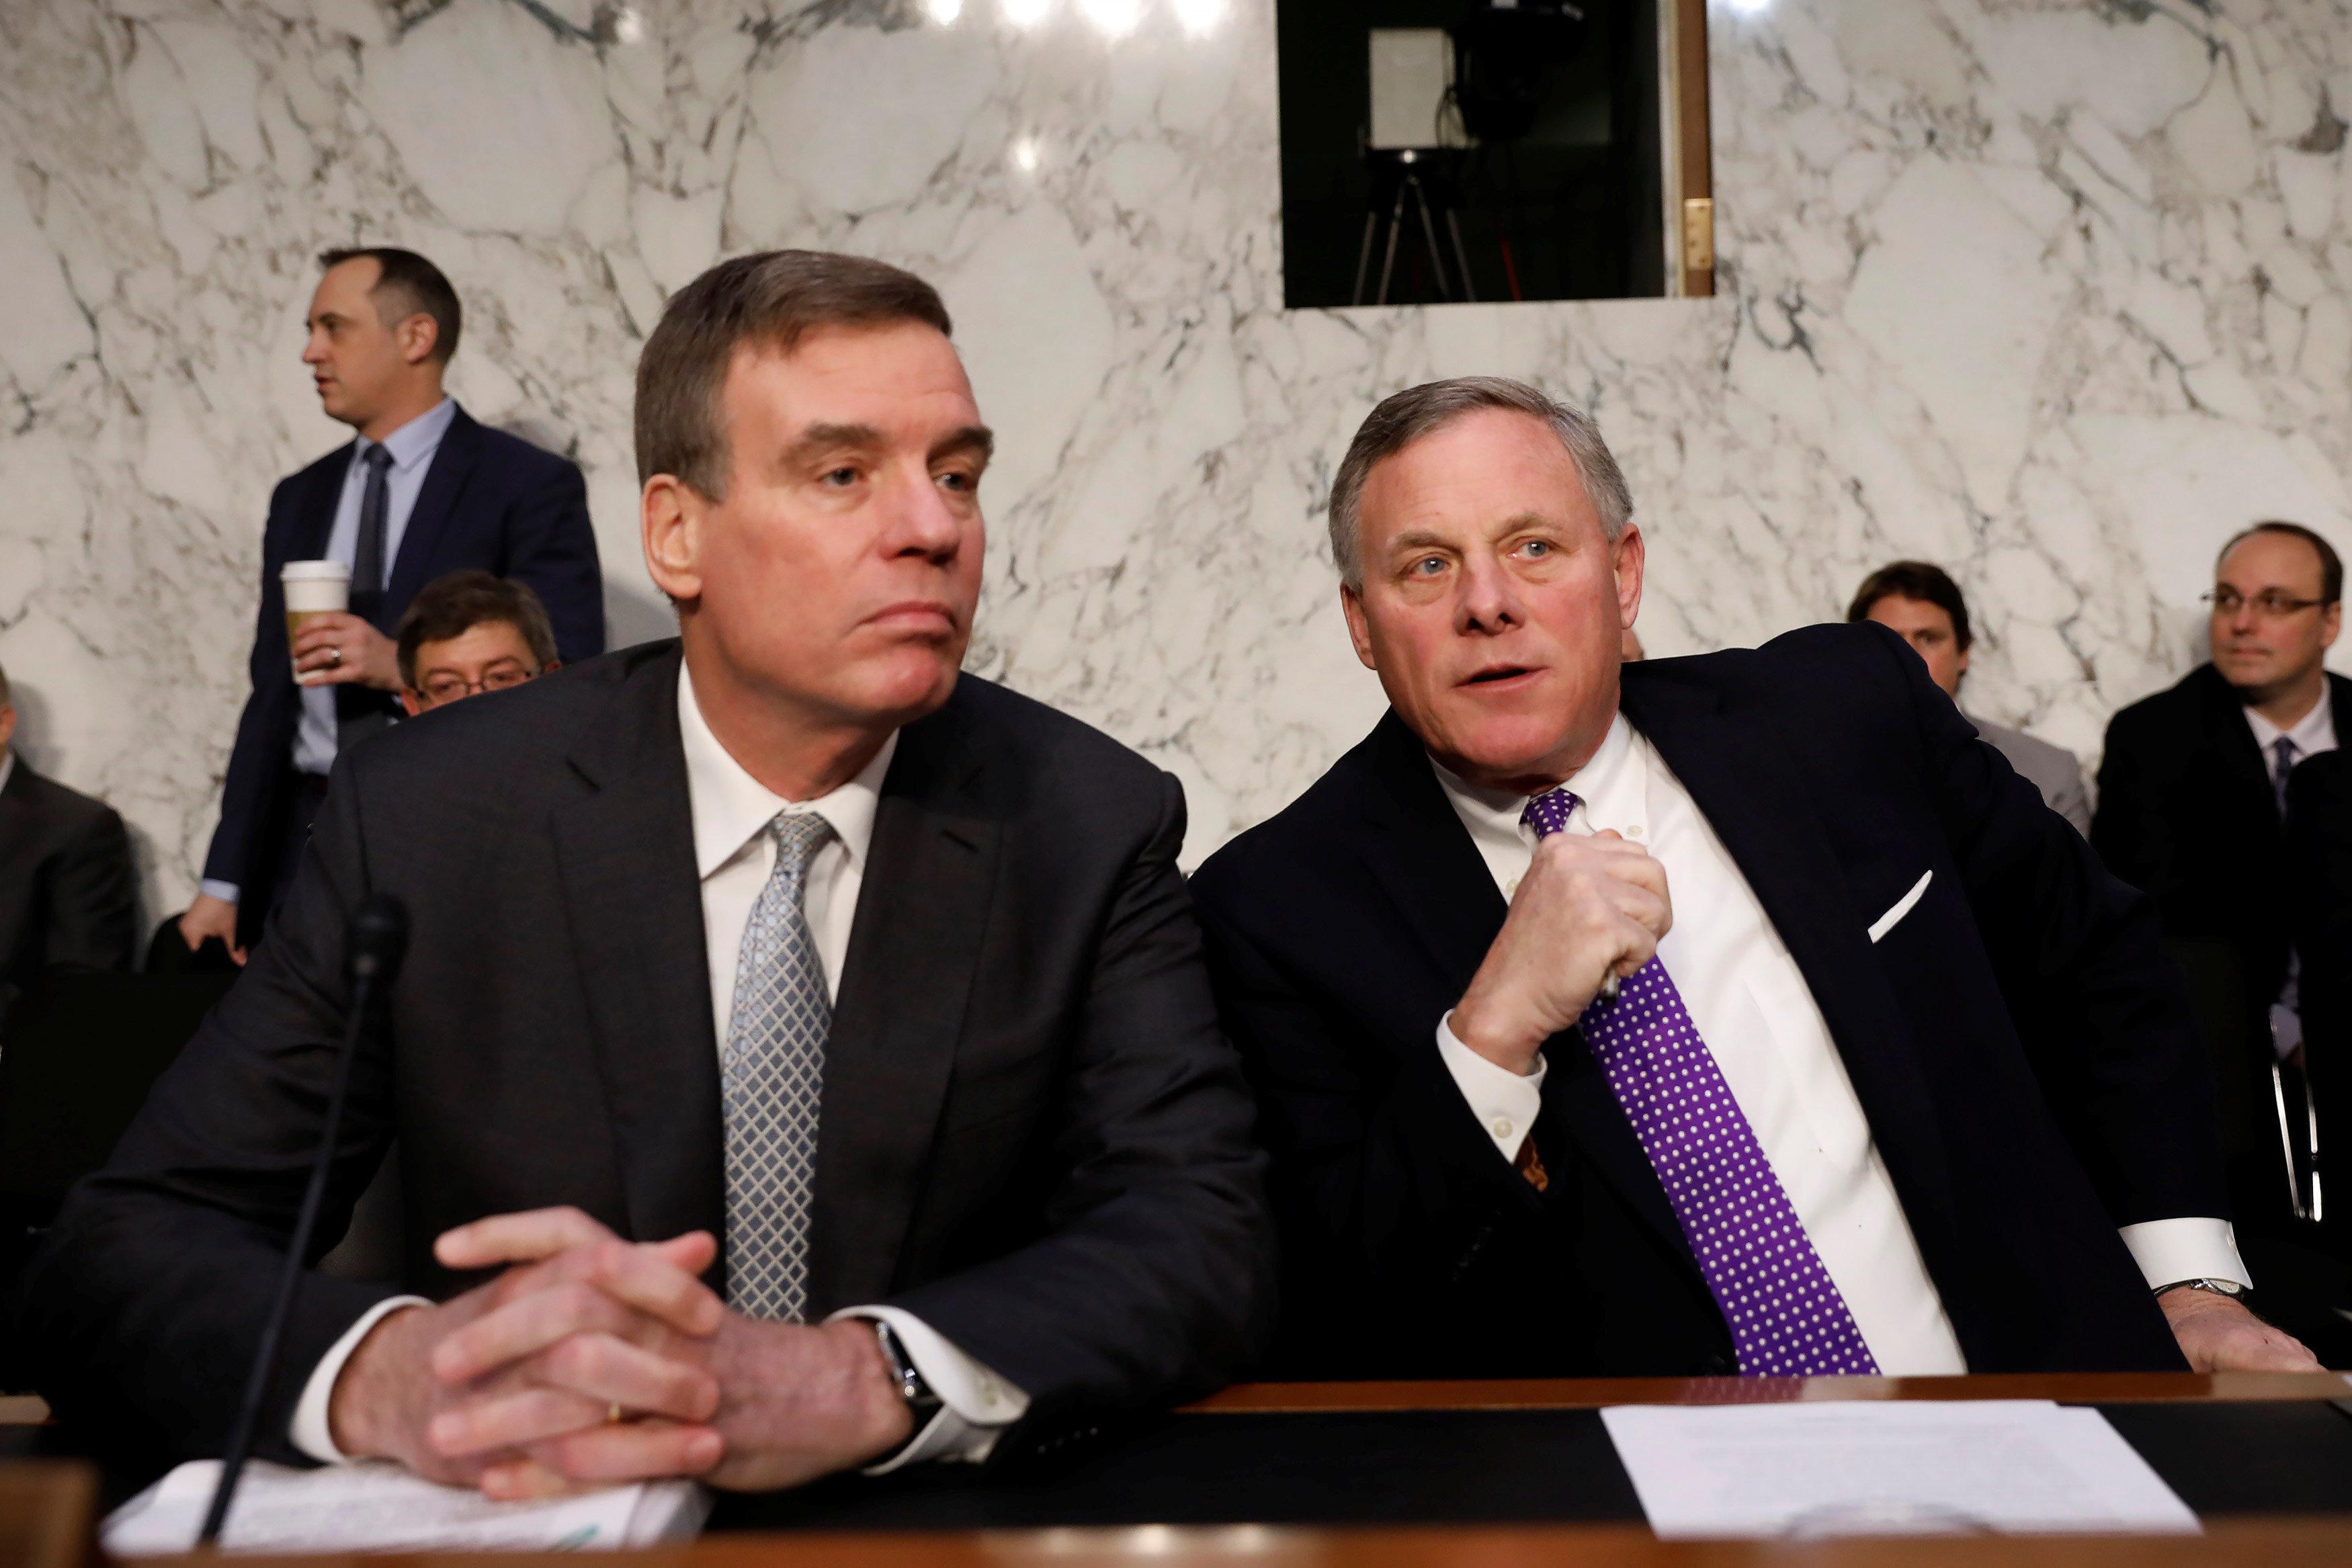 Democratic Sen. Mark Warner of Virginia (left) and Sen. Richard Burr, a North Carolina Republican, spoke to House Speaker Pau